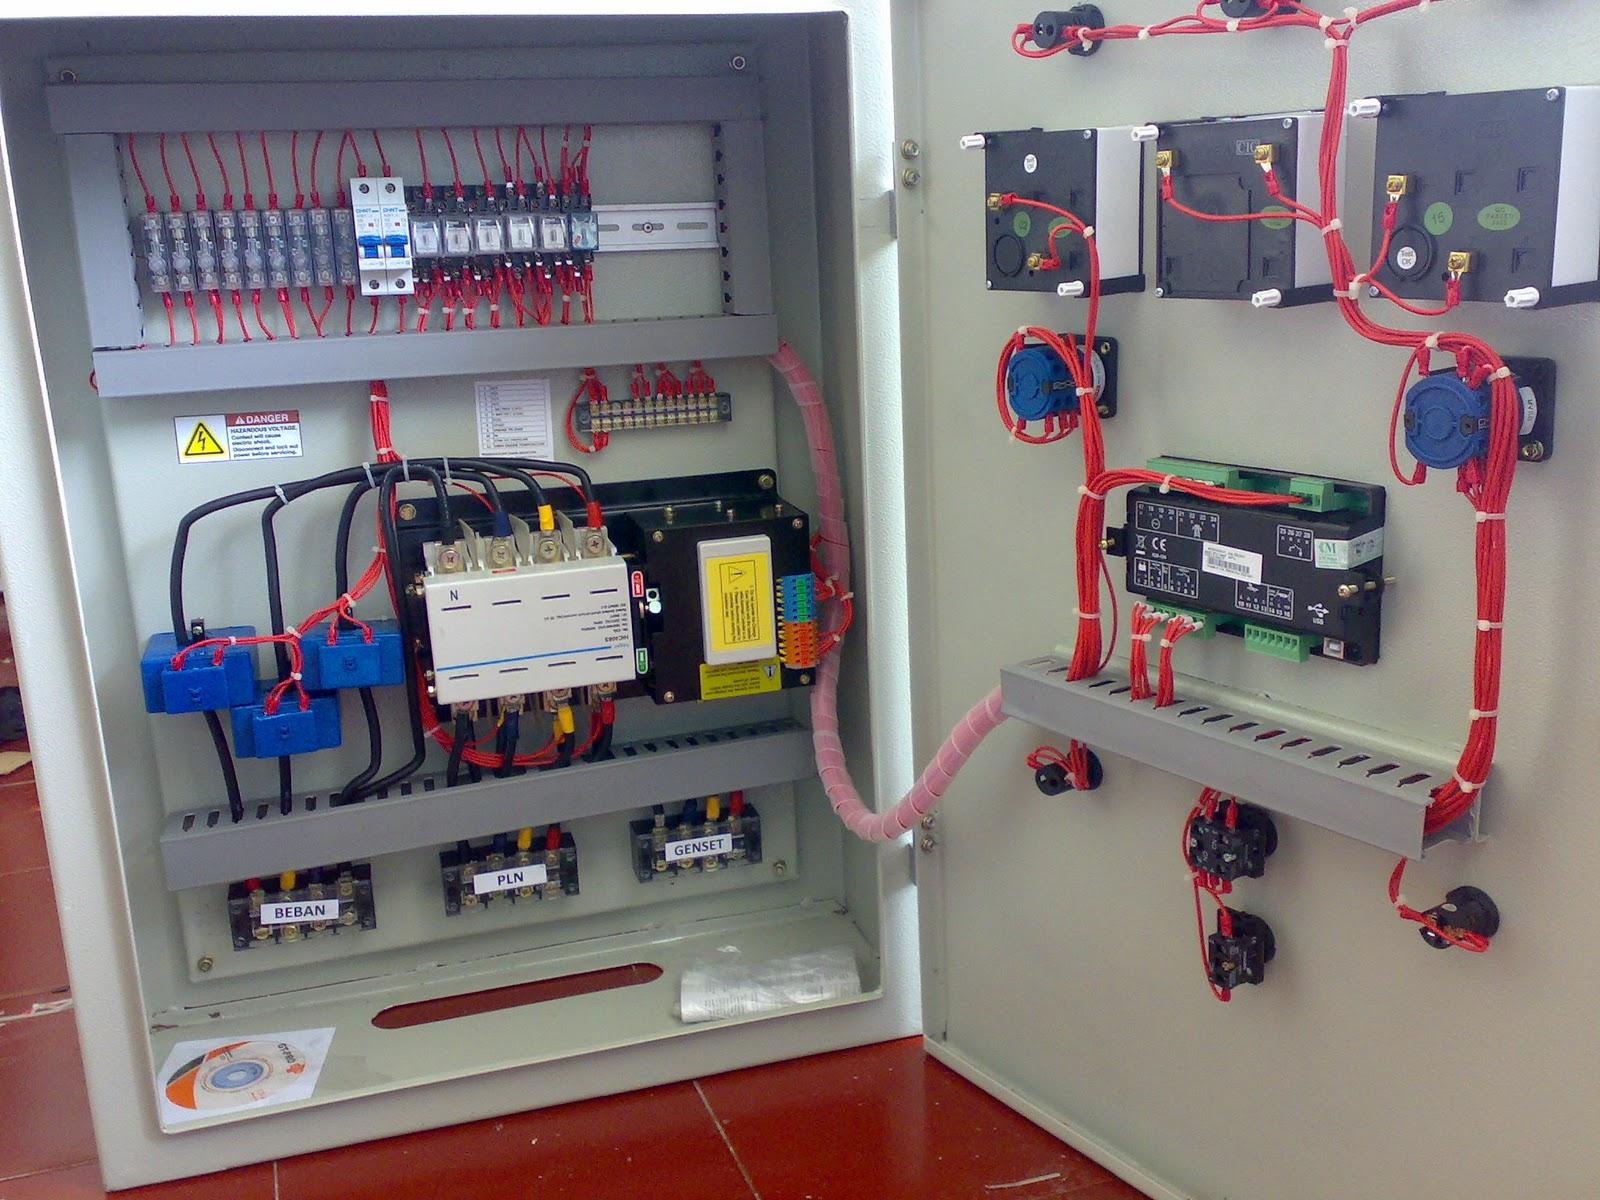 medium resolution of caturindo prima engineering jual panel ats amf rh caturindo pe blogspot com control panel wiring